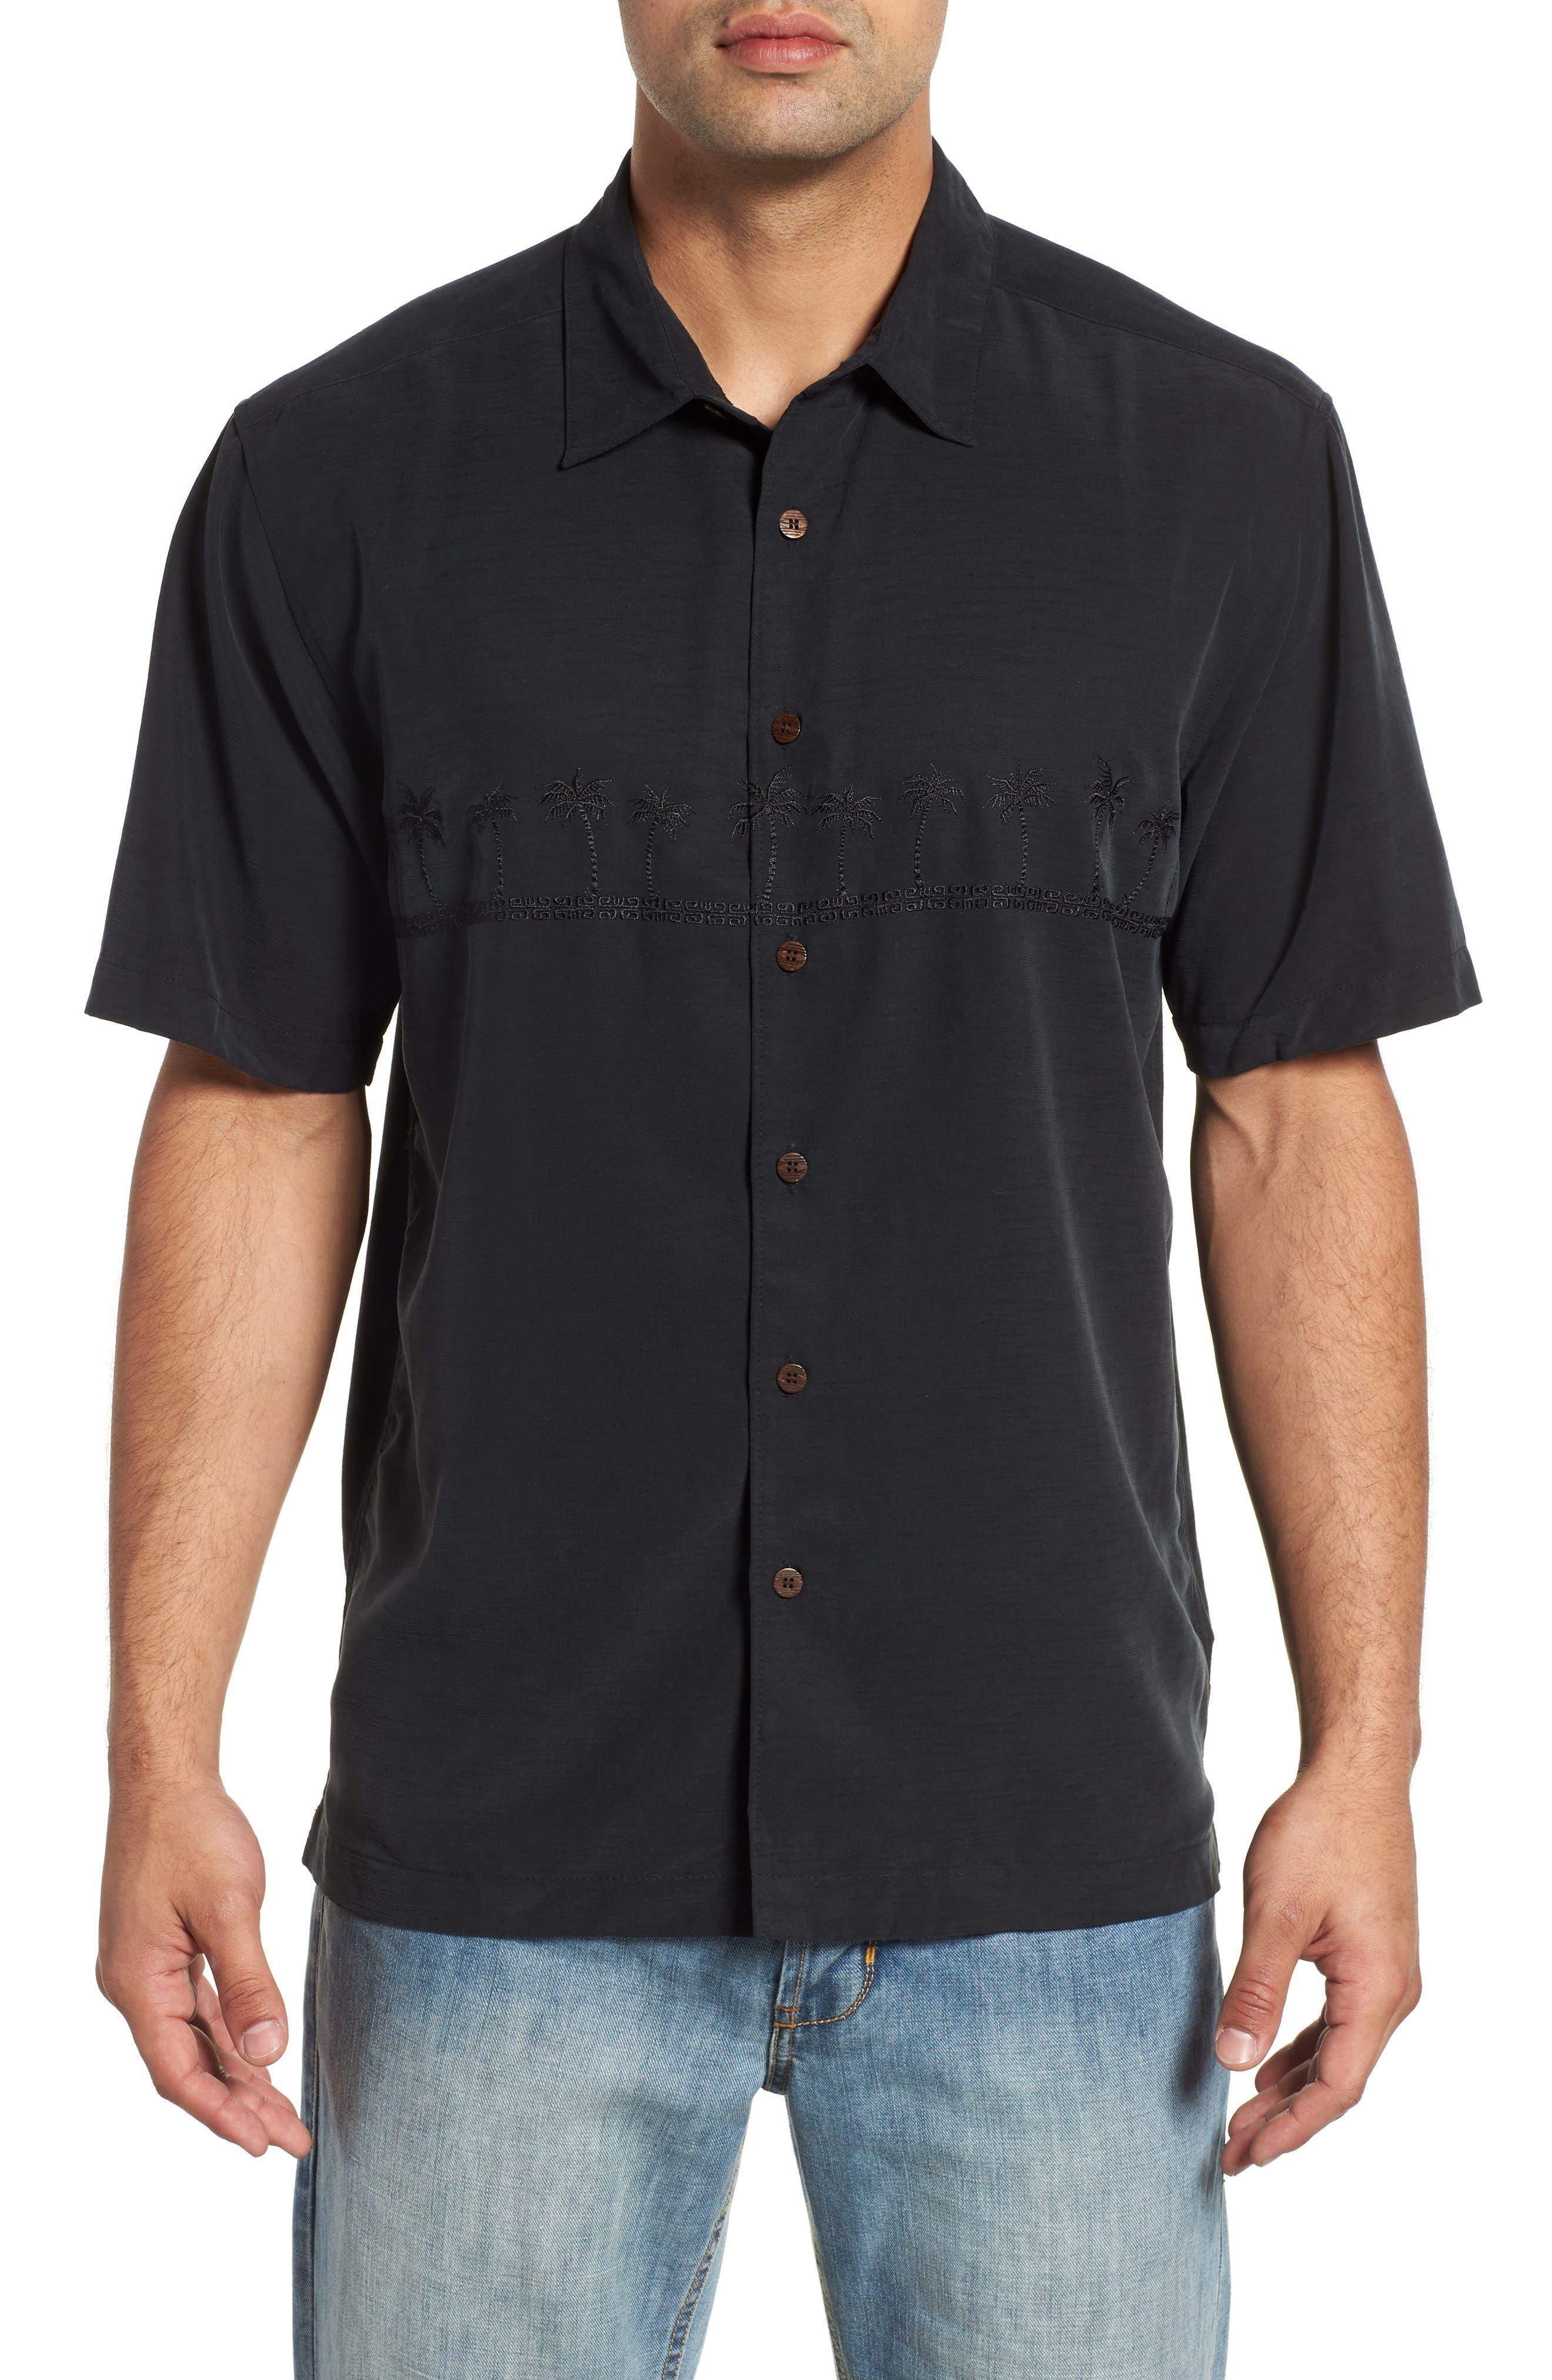 Quiksilver Waterman Collection Tahiti Palms Regular Fit Sport Shirt, Black